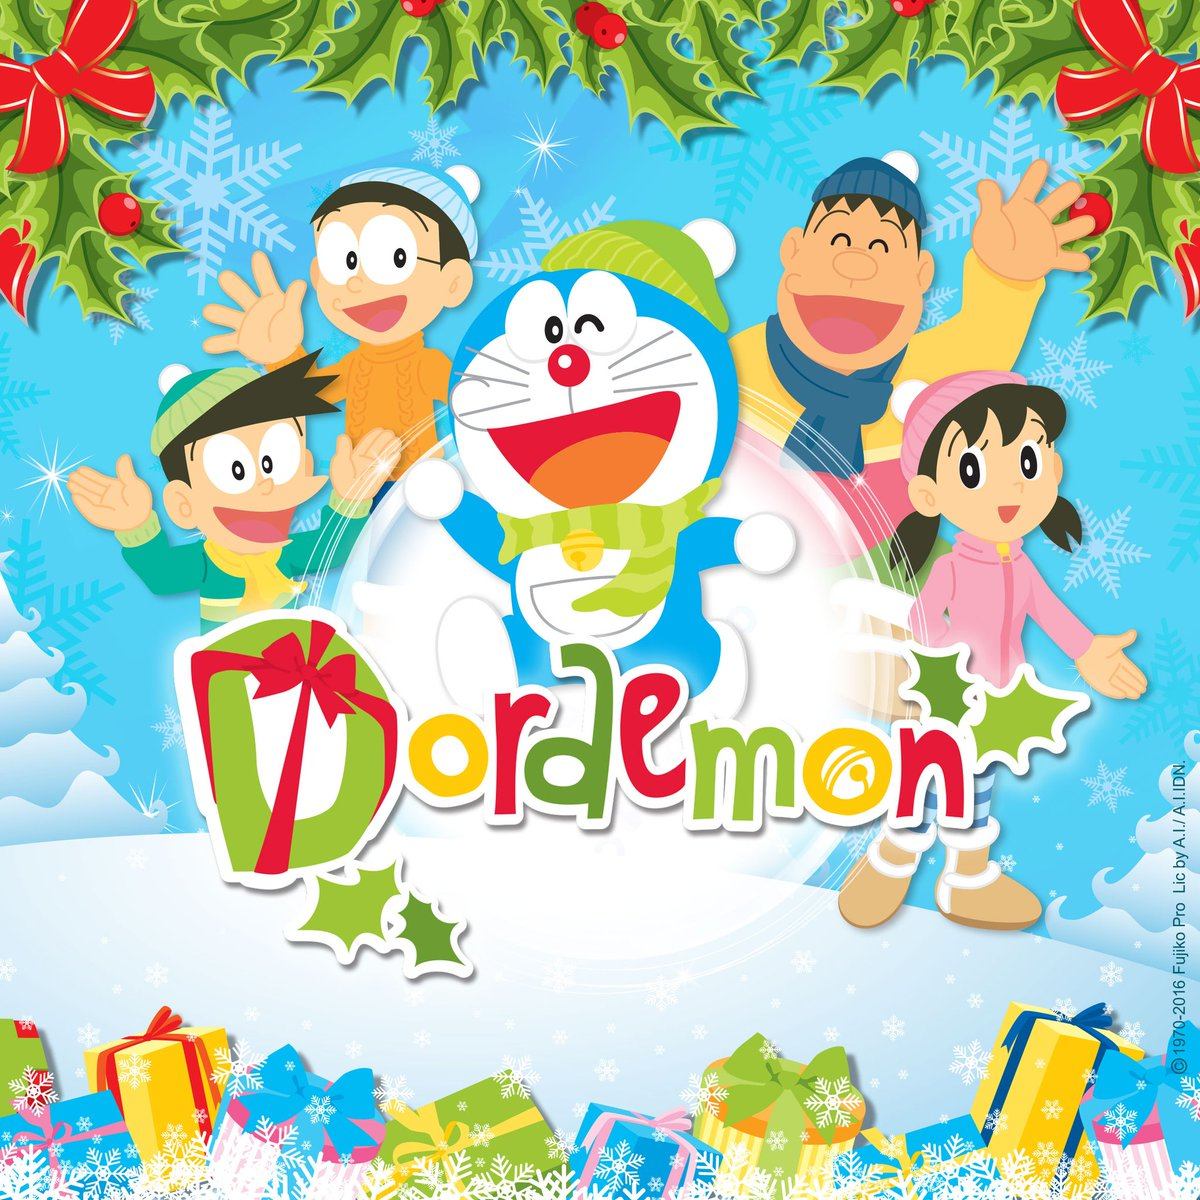 Terima kasih untuk kebersamaan kita selama liburan Natal dan Tahun Baru!  Sampai jumpa di acara berikutnya!  #DoraemonIndonesia https://t.co/GX64T7mXxg